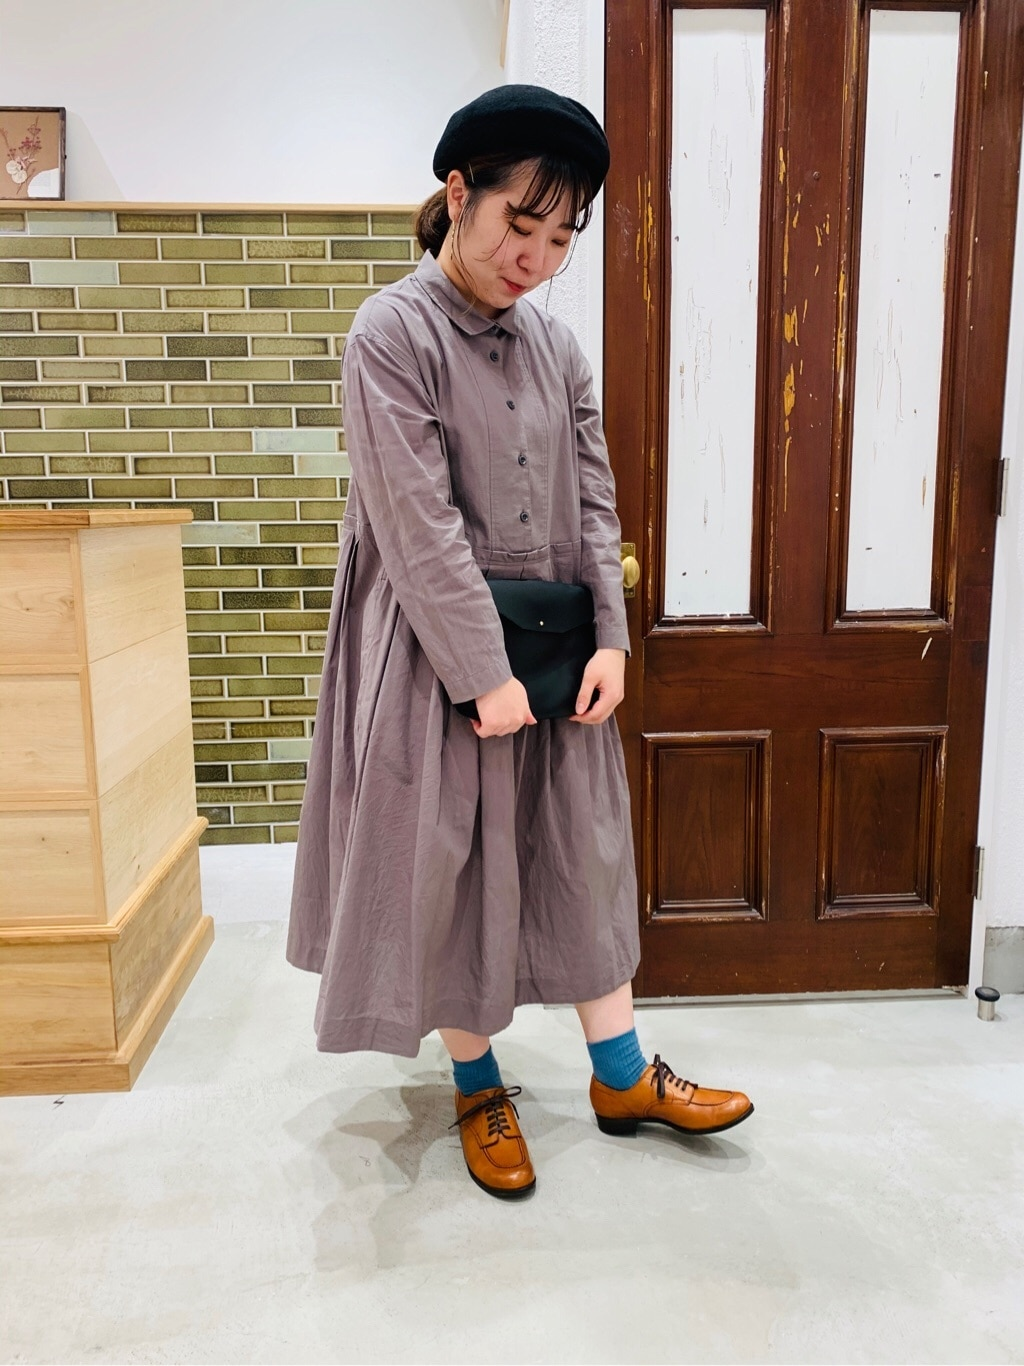 chambre de charme 横浜ジョイナス 身長:155cm 2020.09.12